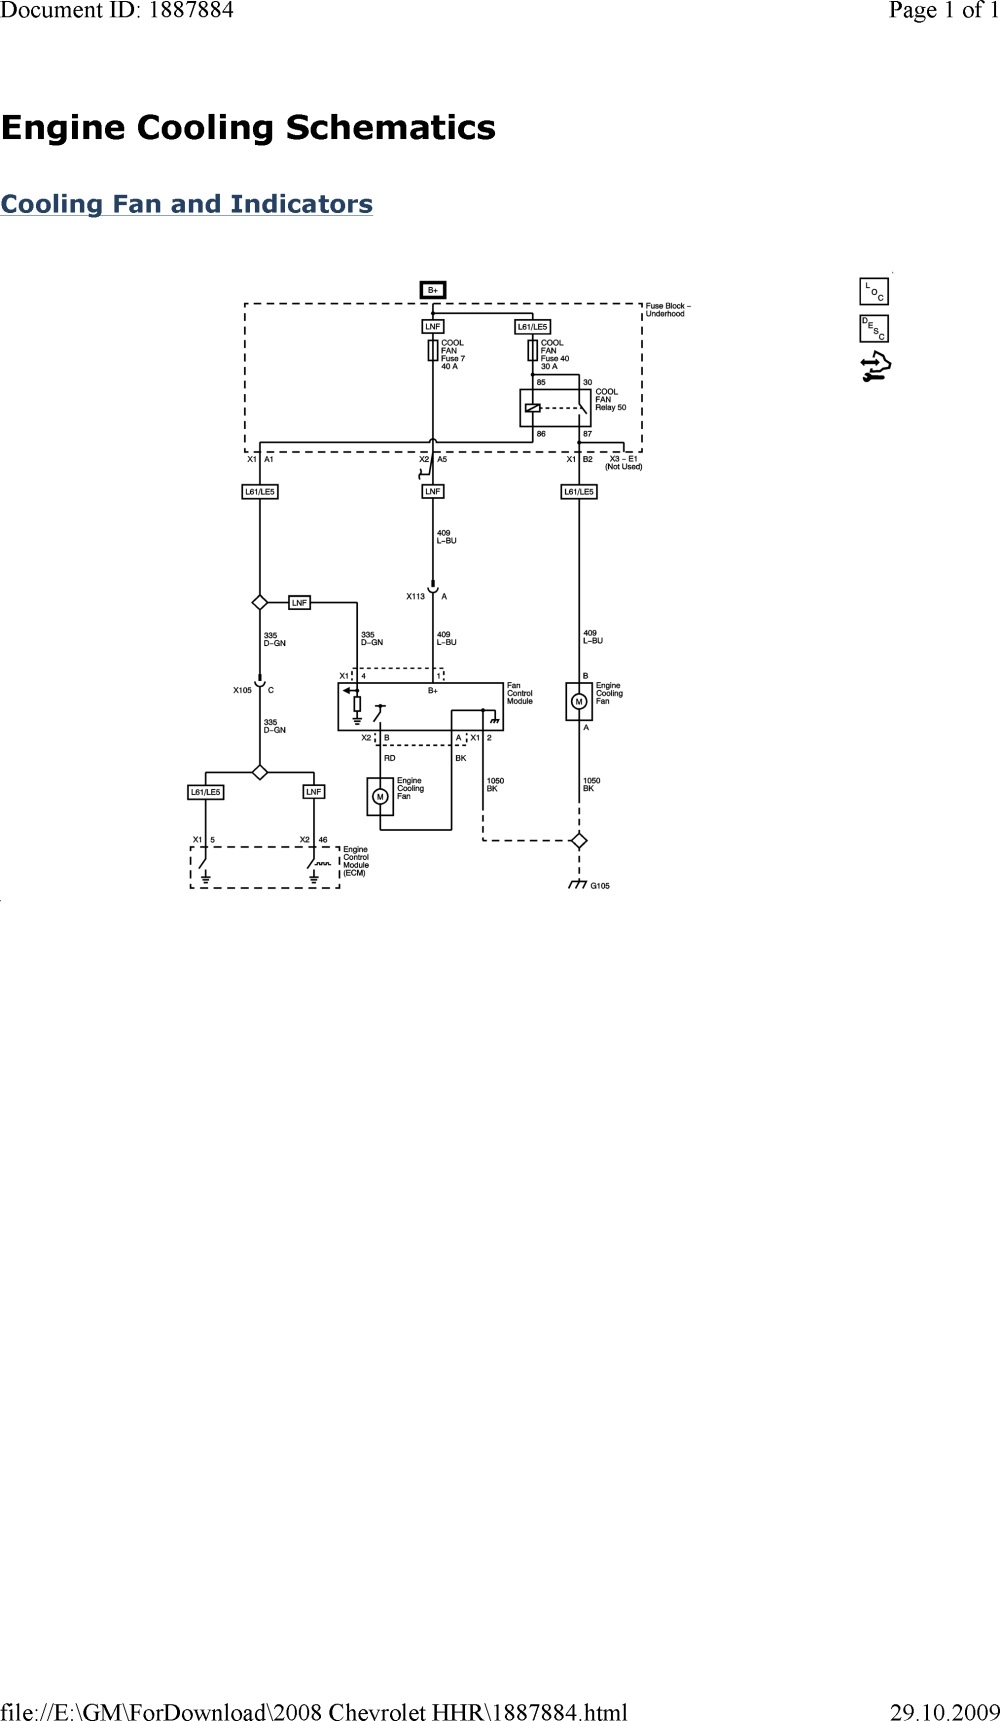 2004 Grand Am Fuse Box Diagram. Diagrams. Wiring Diagram